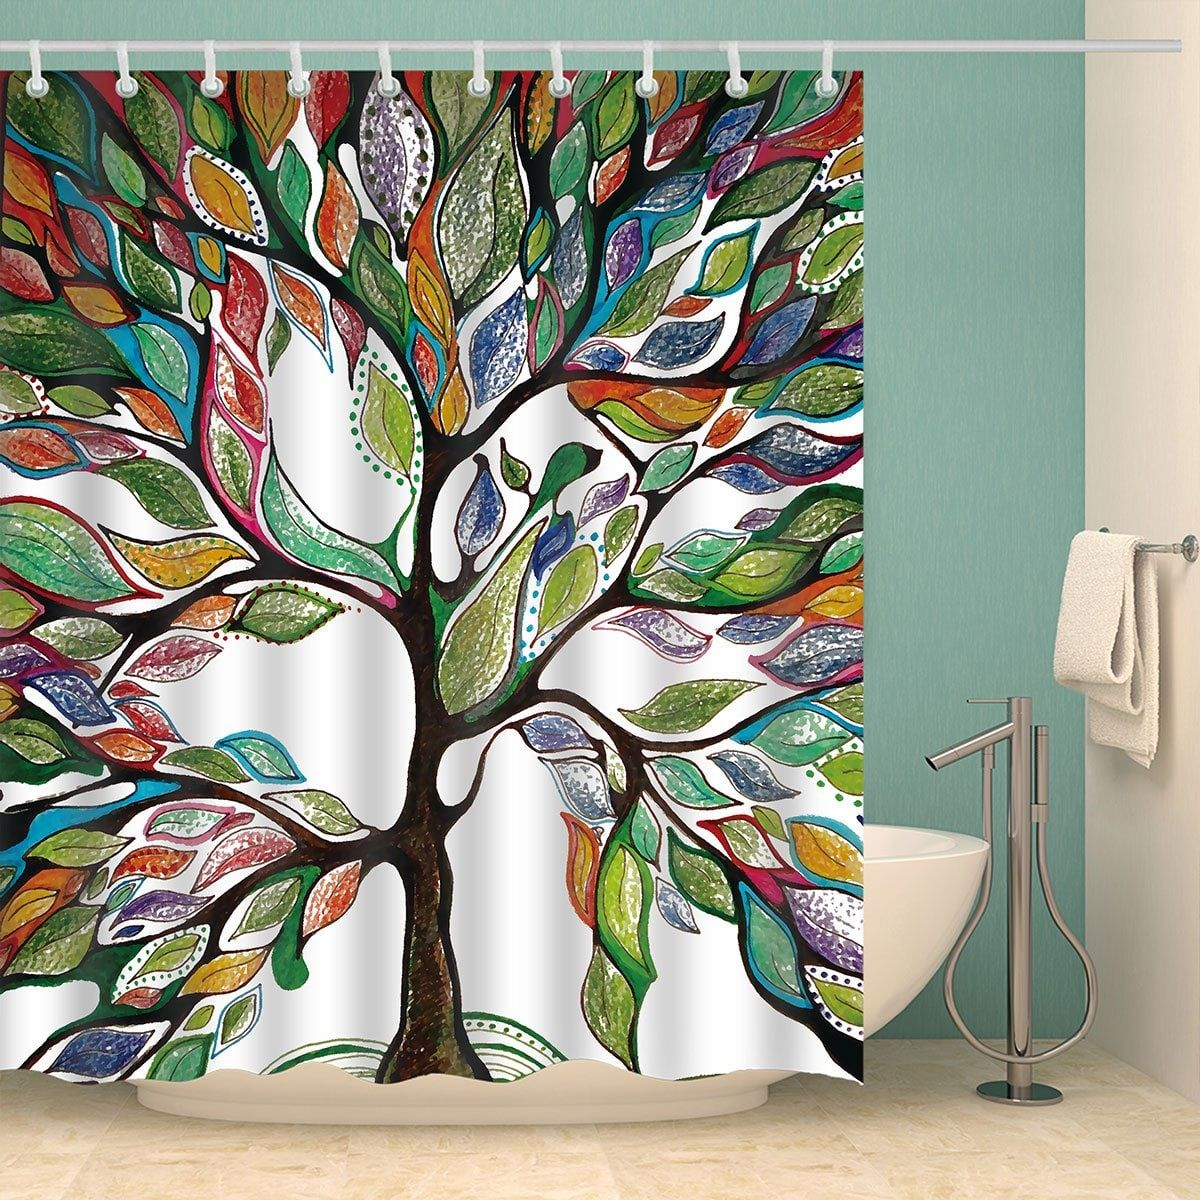 Colorful Tree Of Life Print Waterproof Shower Curtain Bathroom